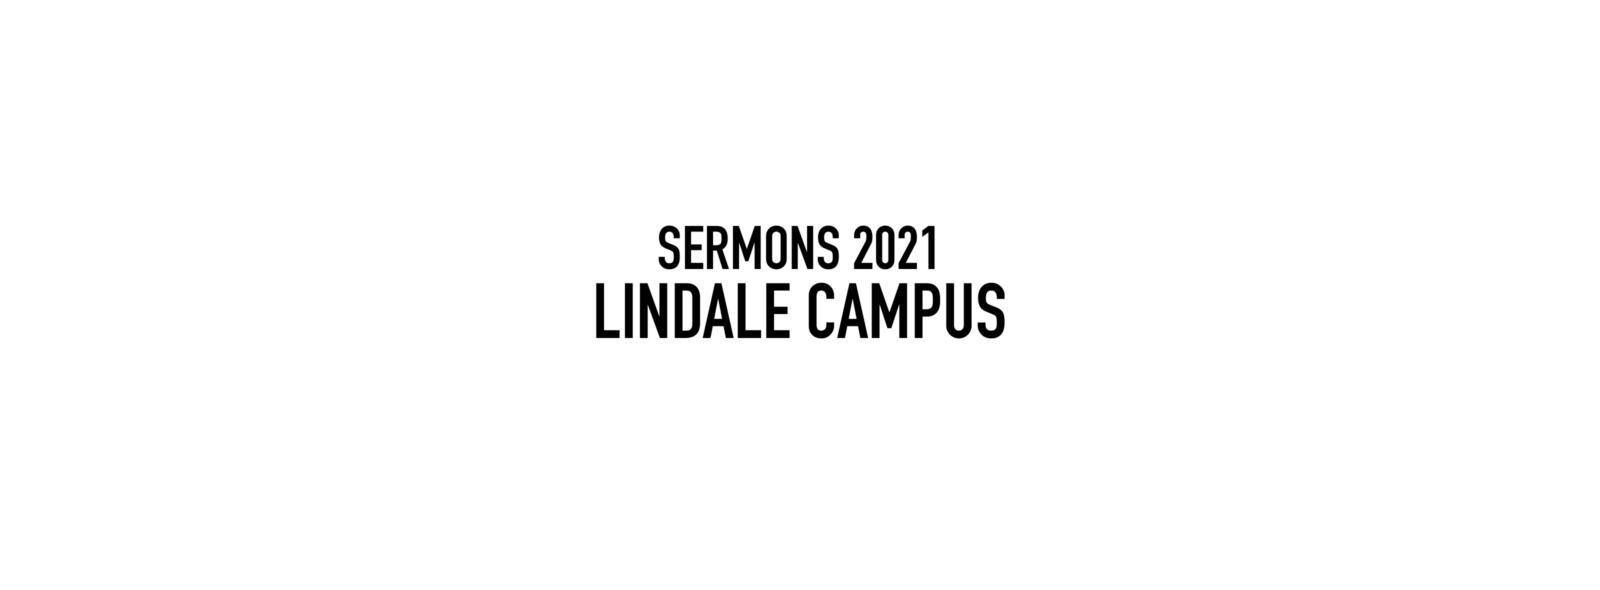 Sermon Series 2021 Lindale